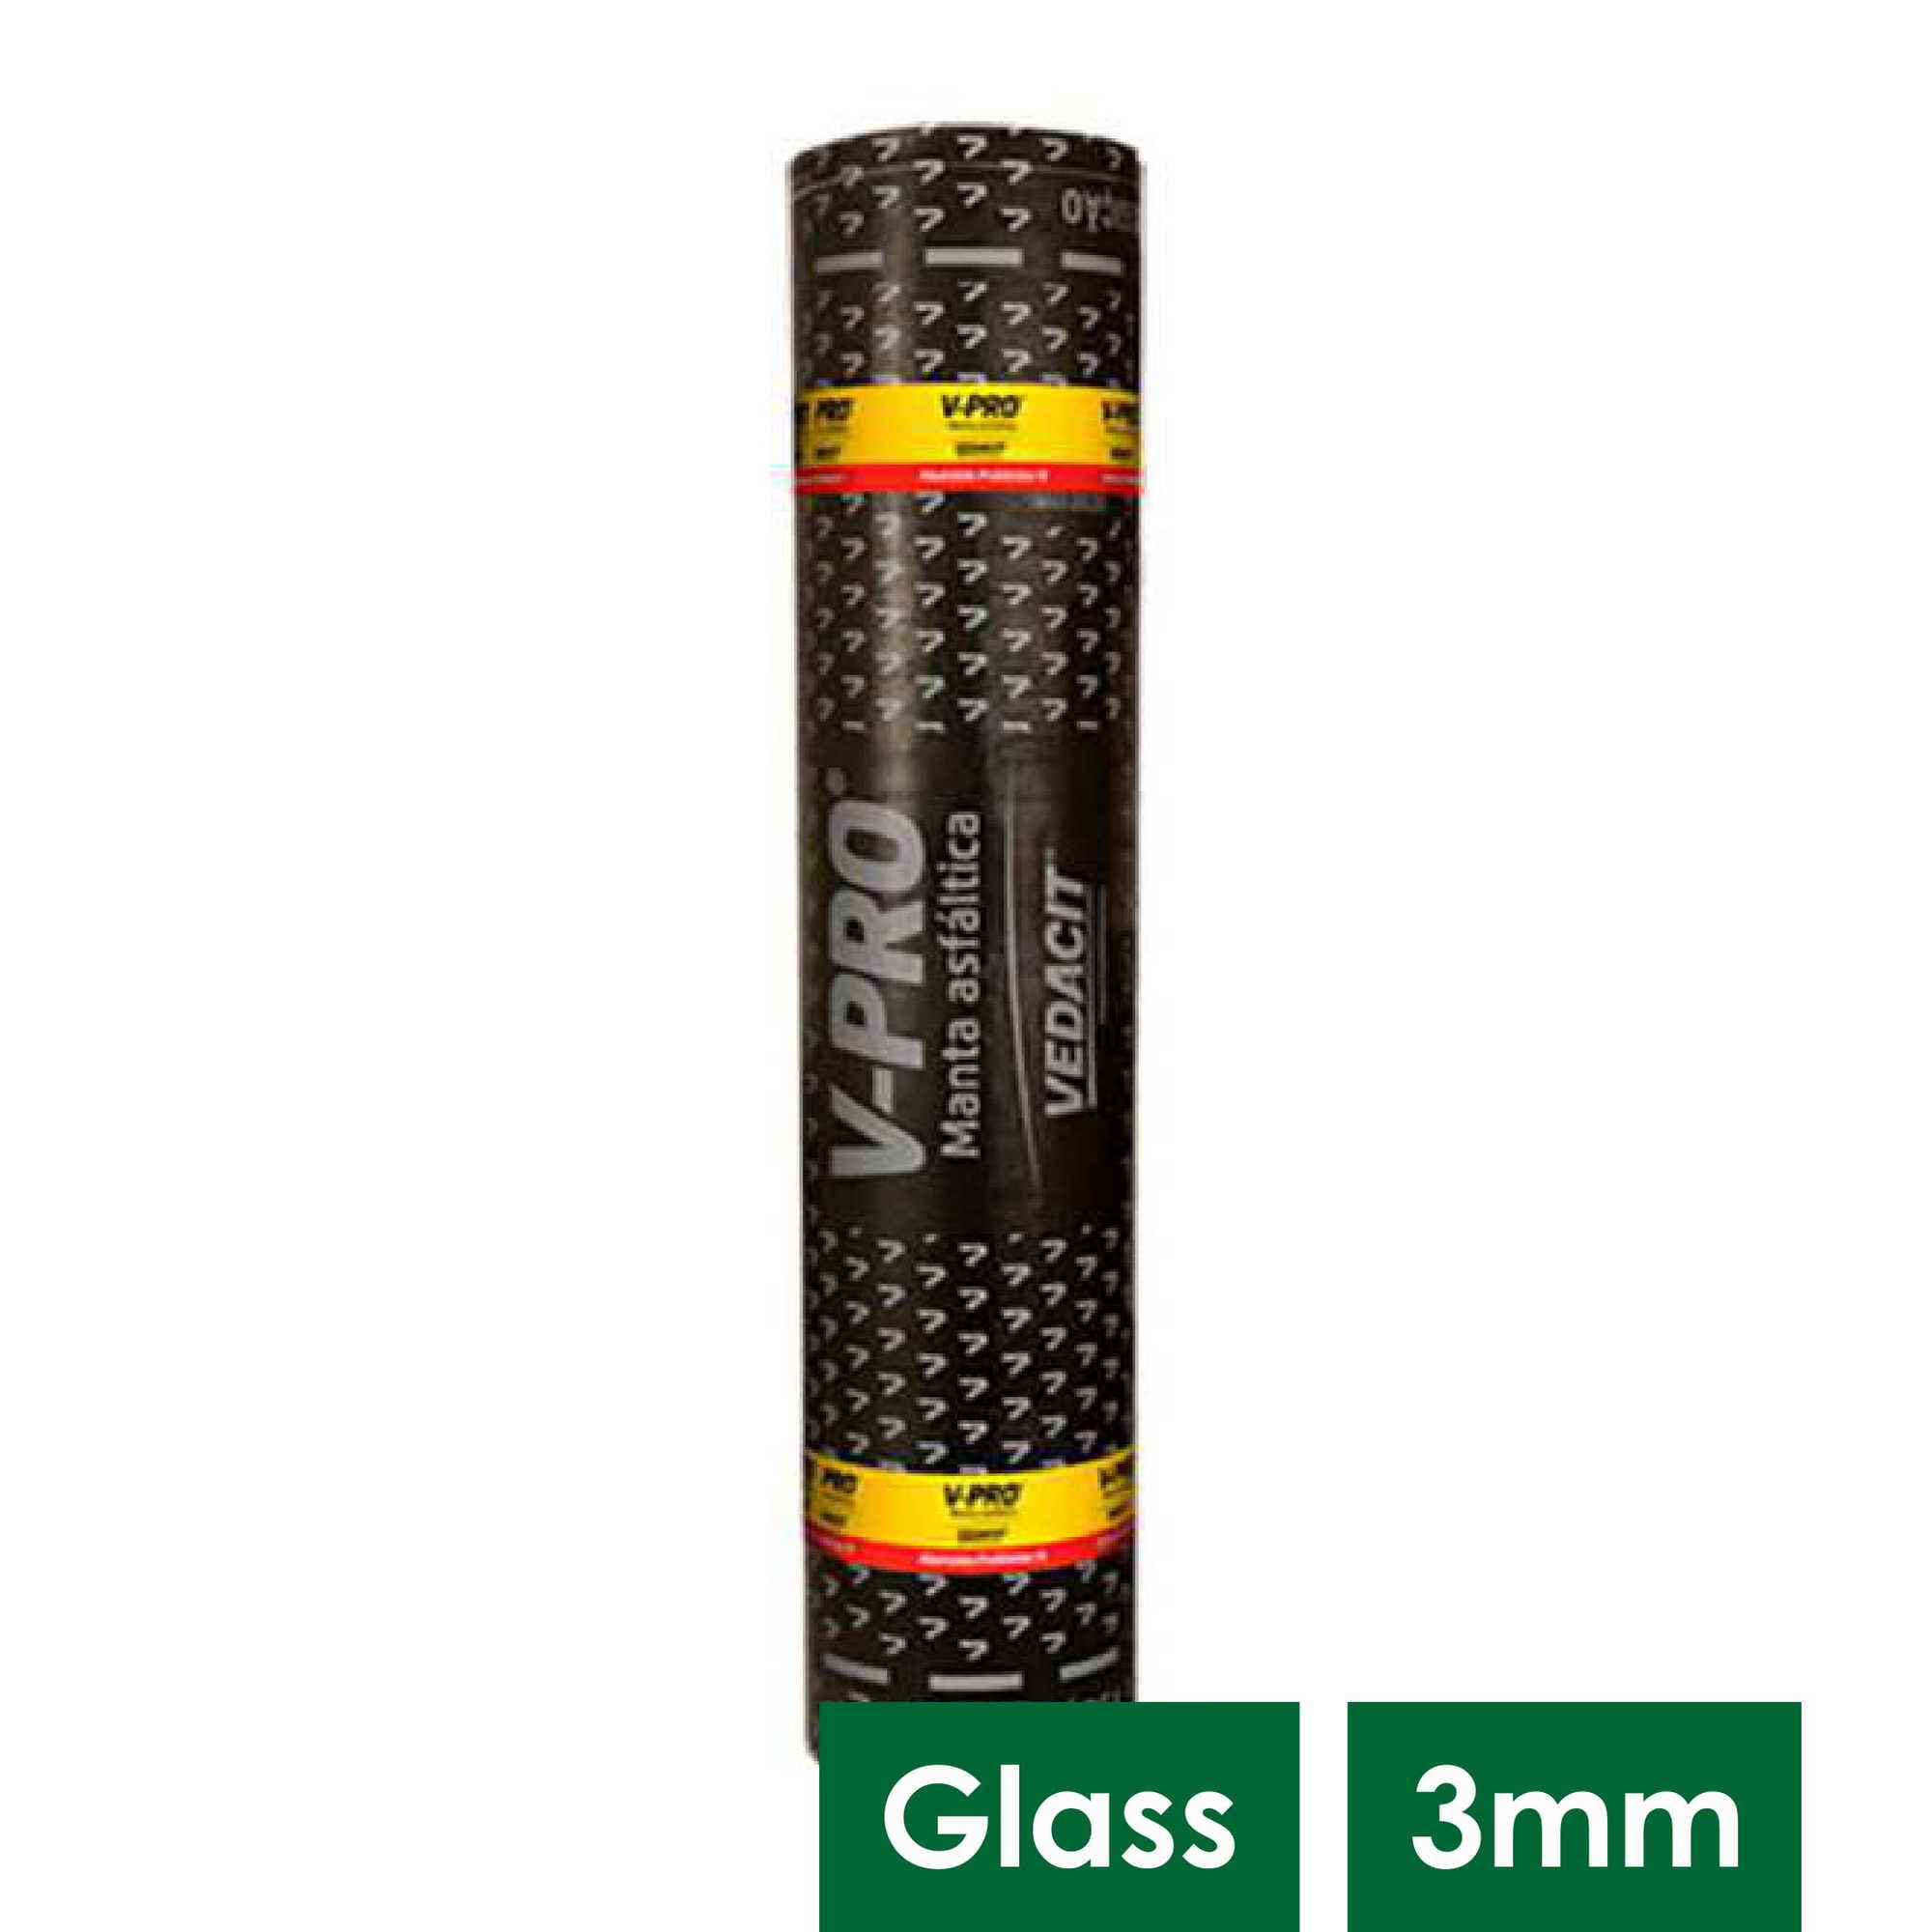 V PRO II B ALUMINIO GLASS 3 MM RL 10 M2